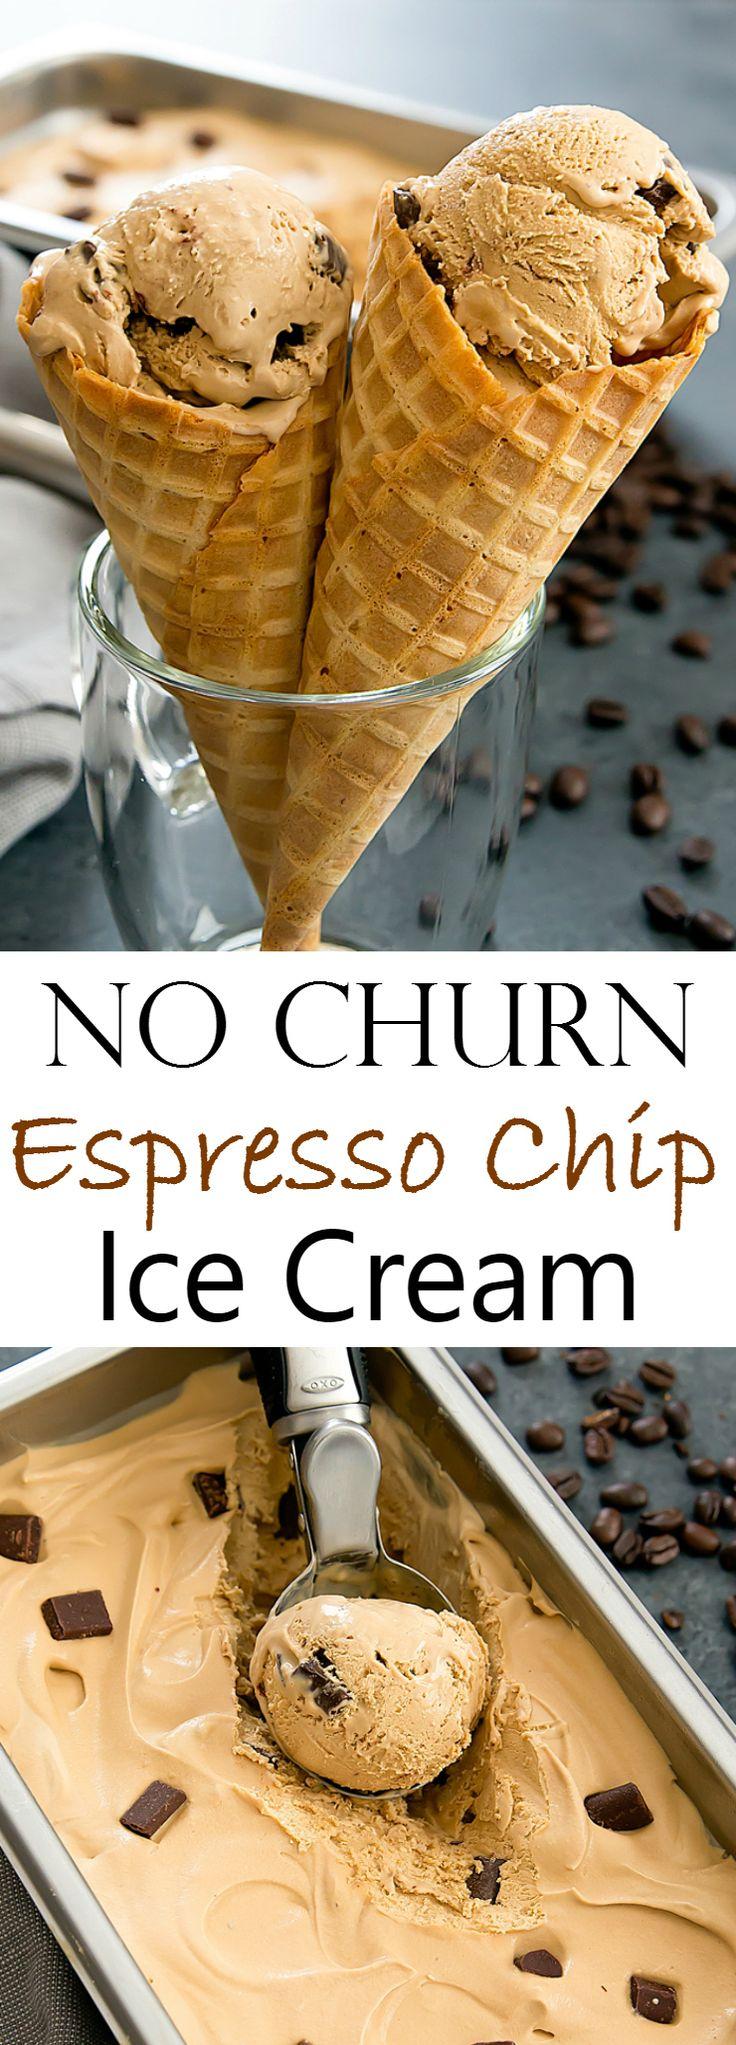 No Churn Espresso Chocolate Chip Ice Cream. Creamy, homemade ice cream that doesn't need an ice cream maker!